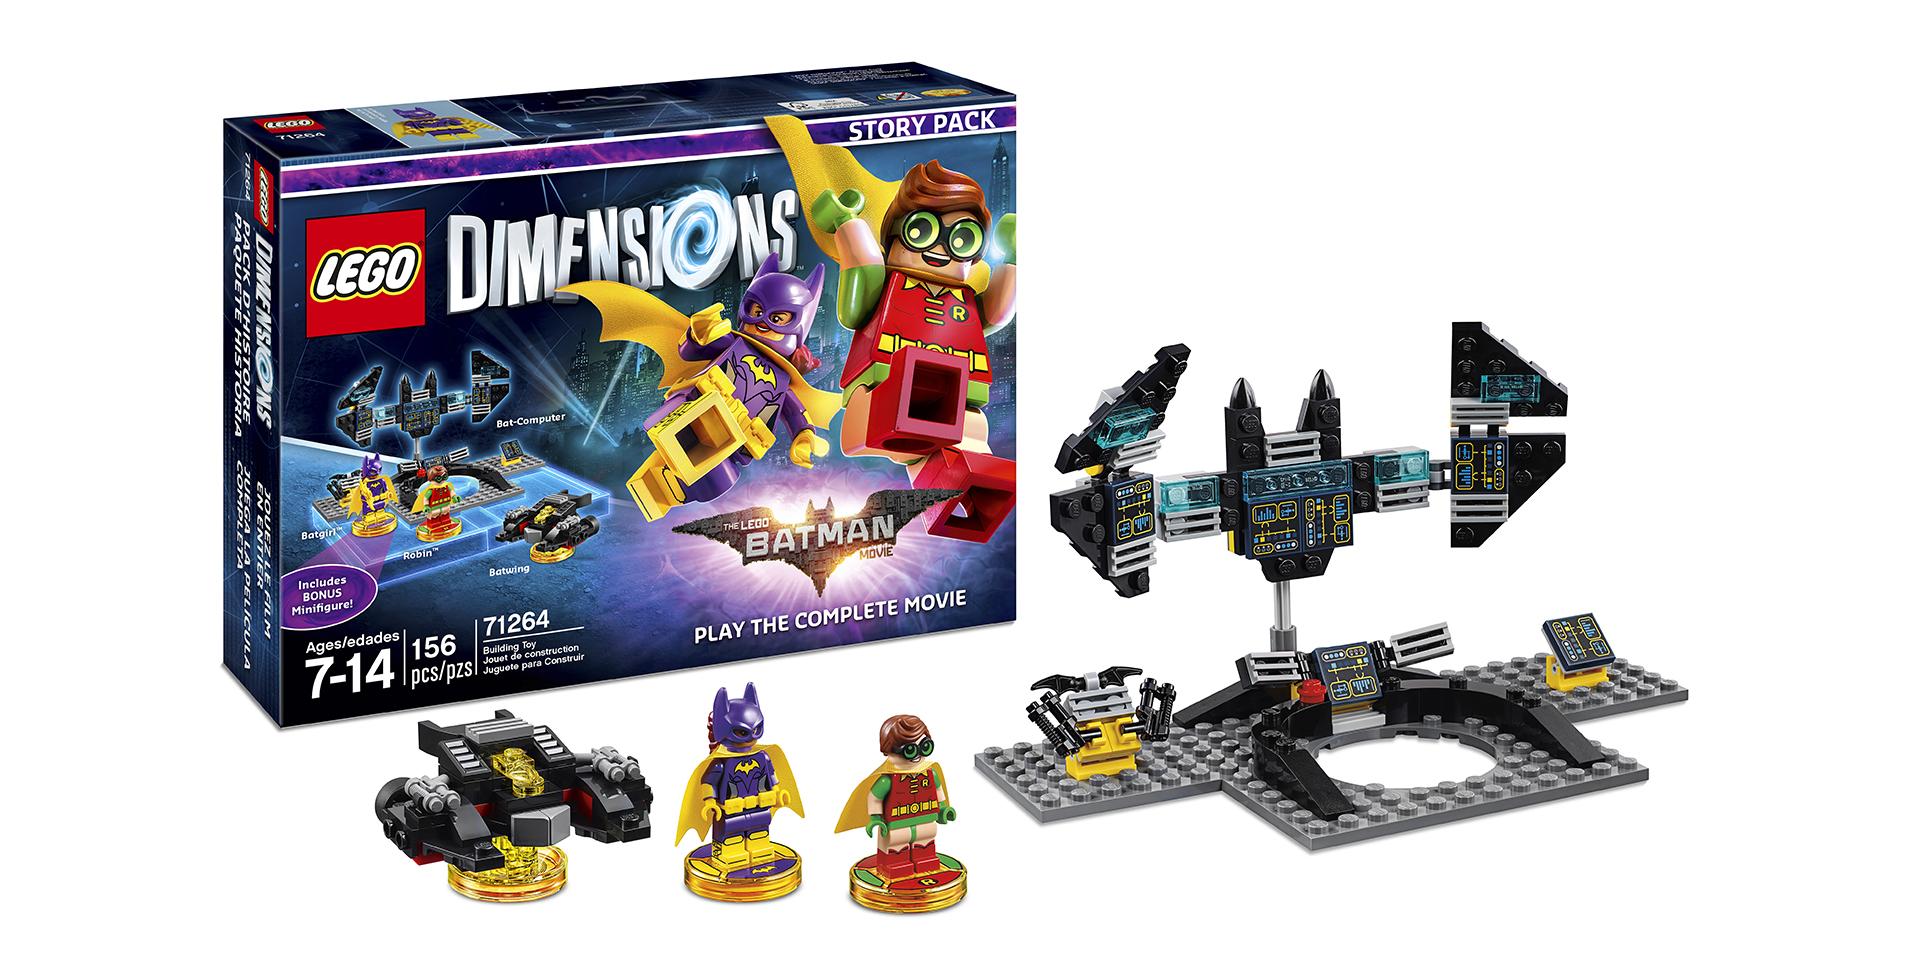 LEGO Dimensions - LEGO Batman Movie Story Pack